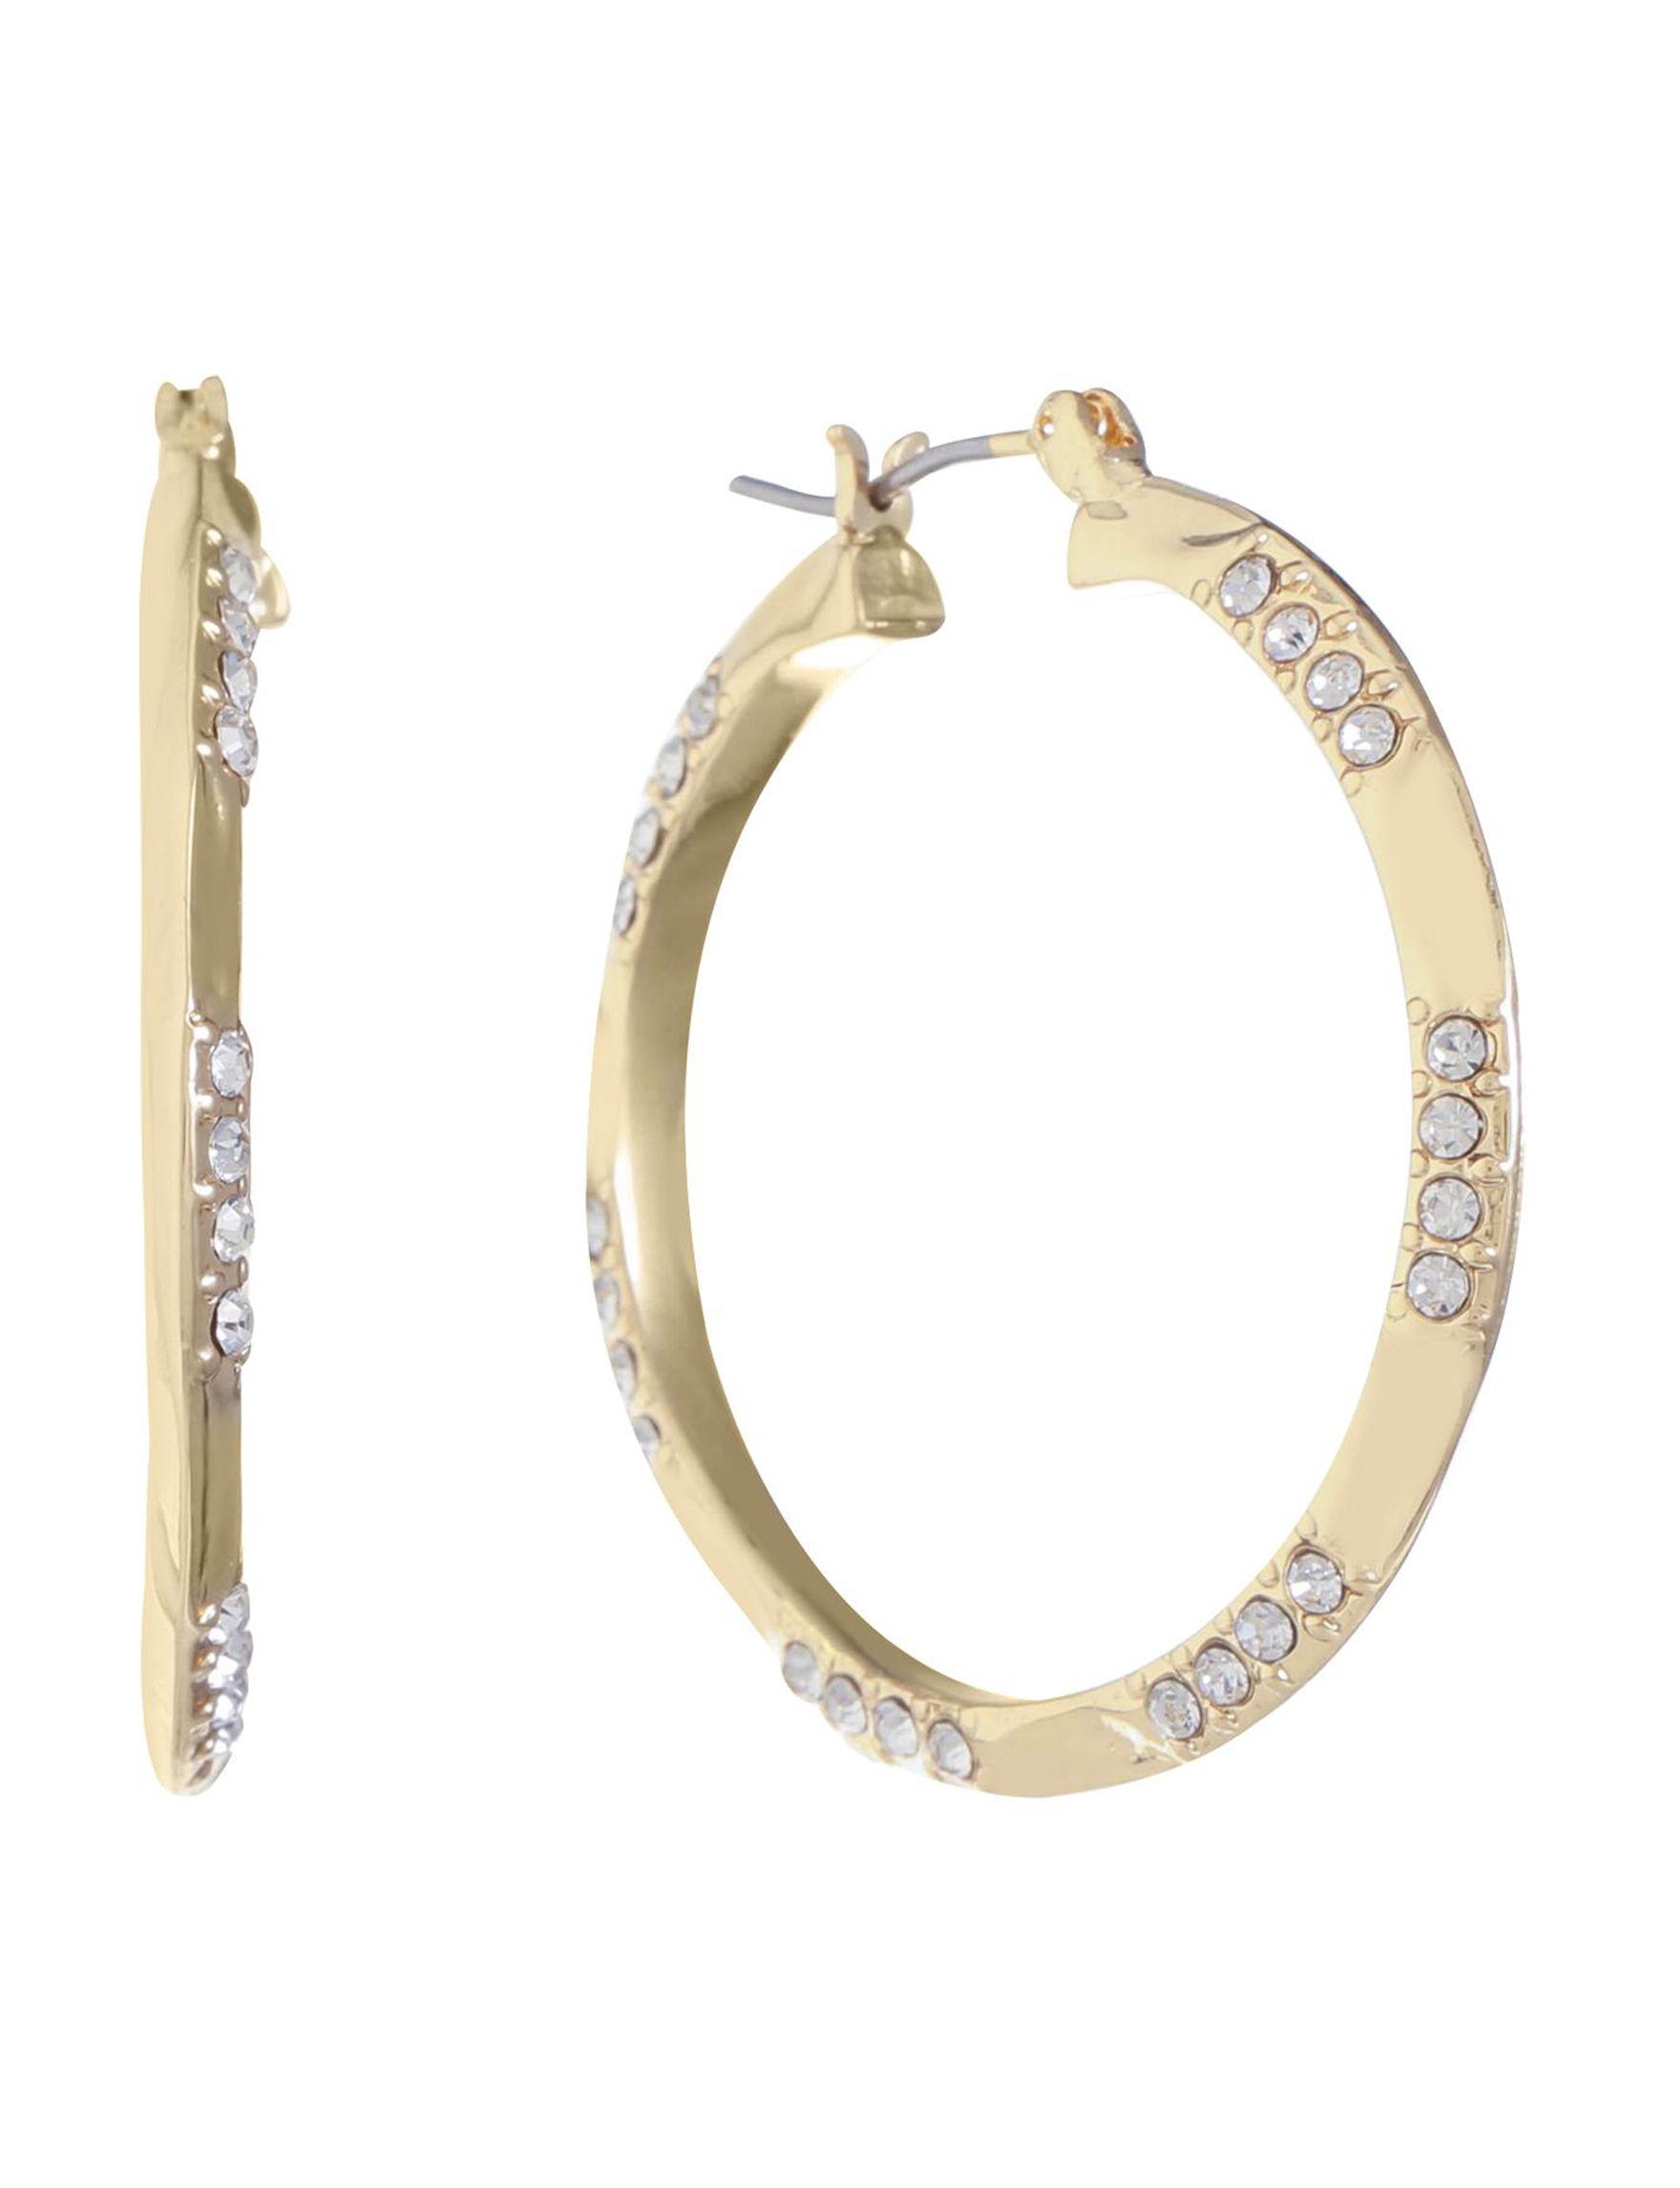 Gloria Vanderbilt Gold / Crystal Hoops Earrings Fashion Jewelry